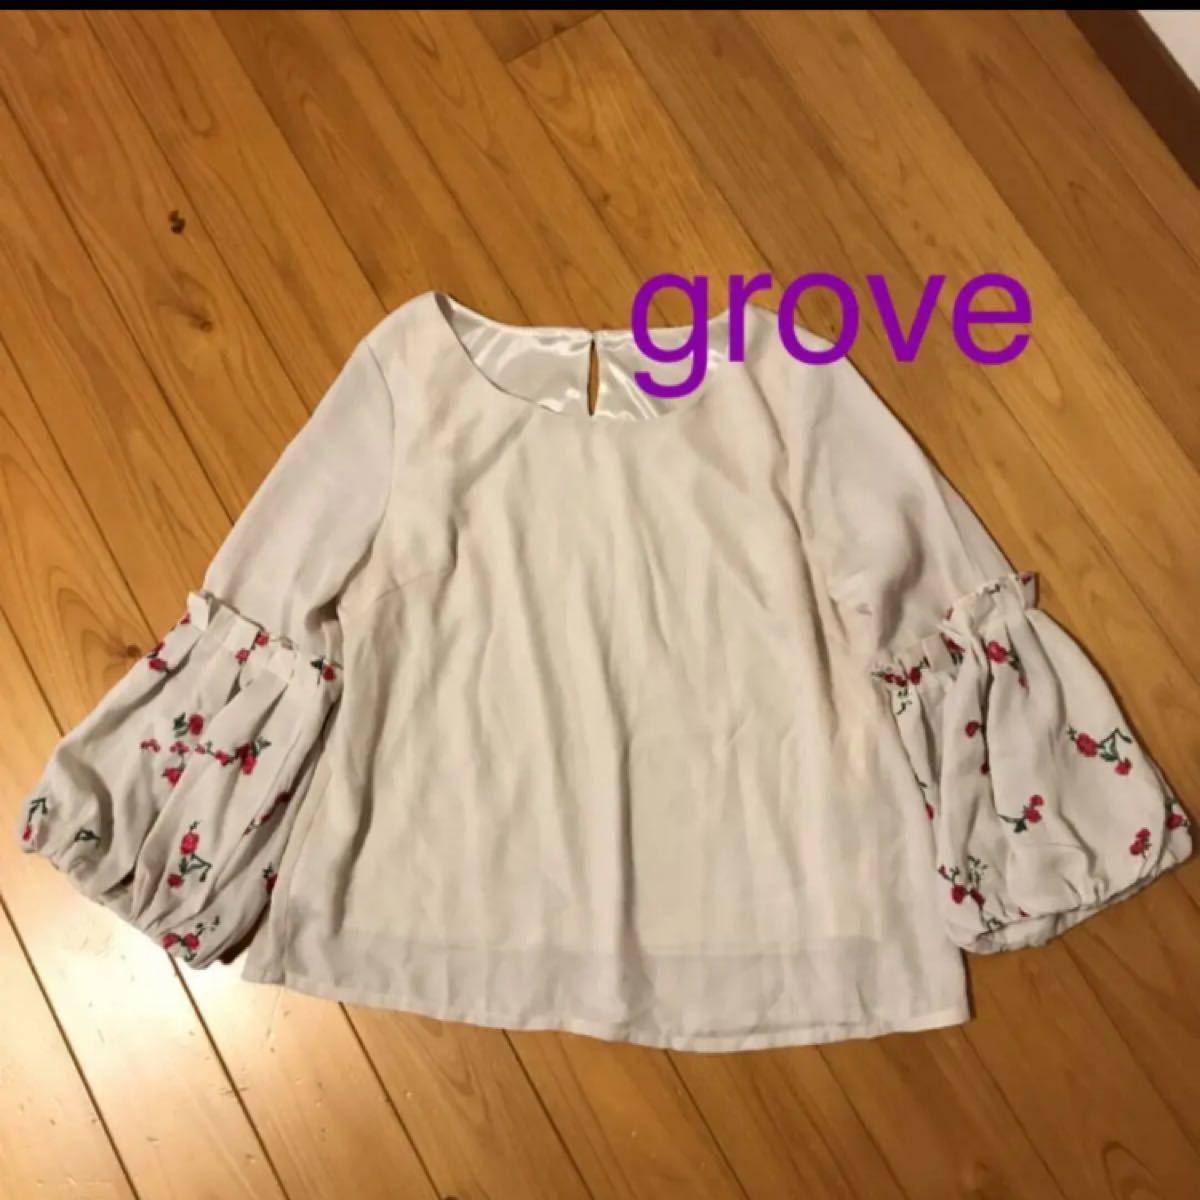 grove    春 花刺繍のトップス